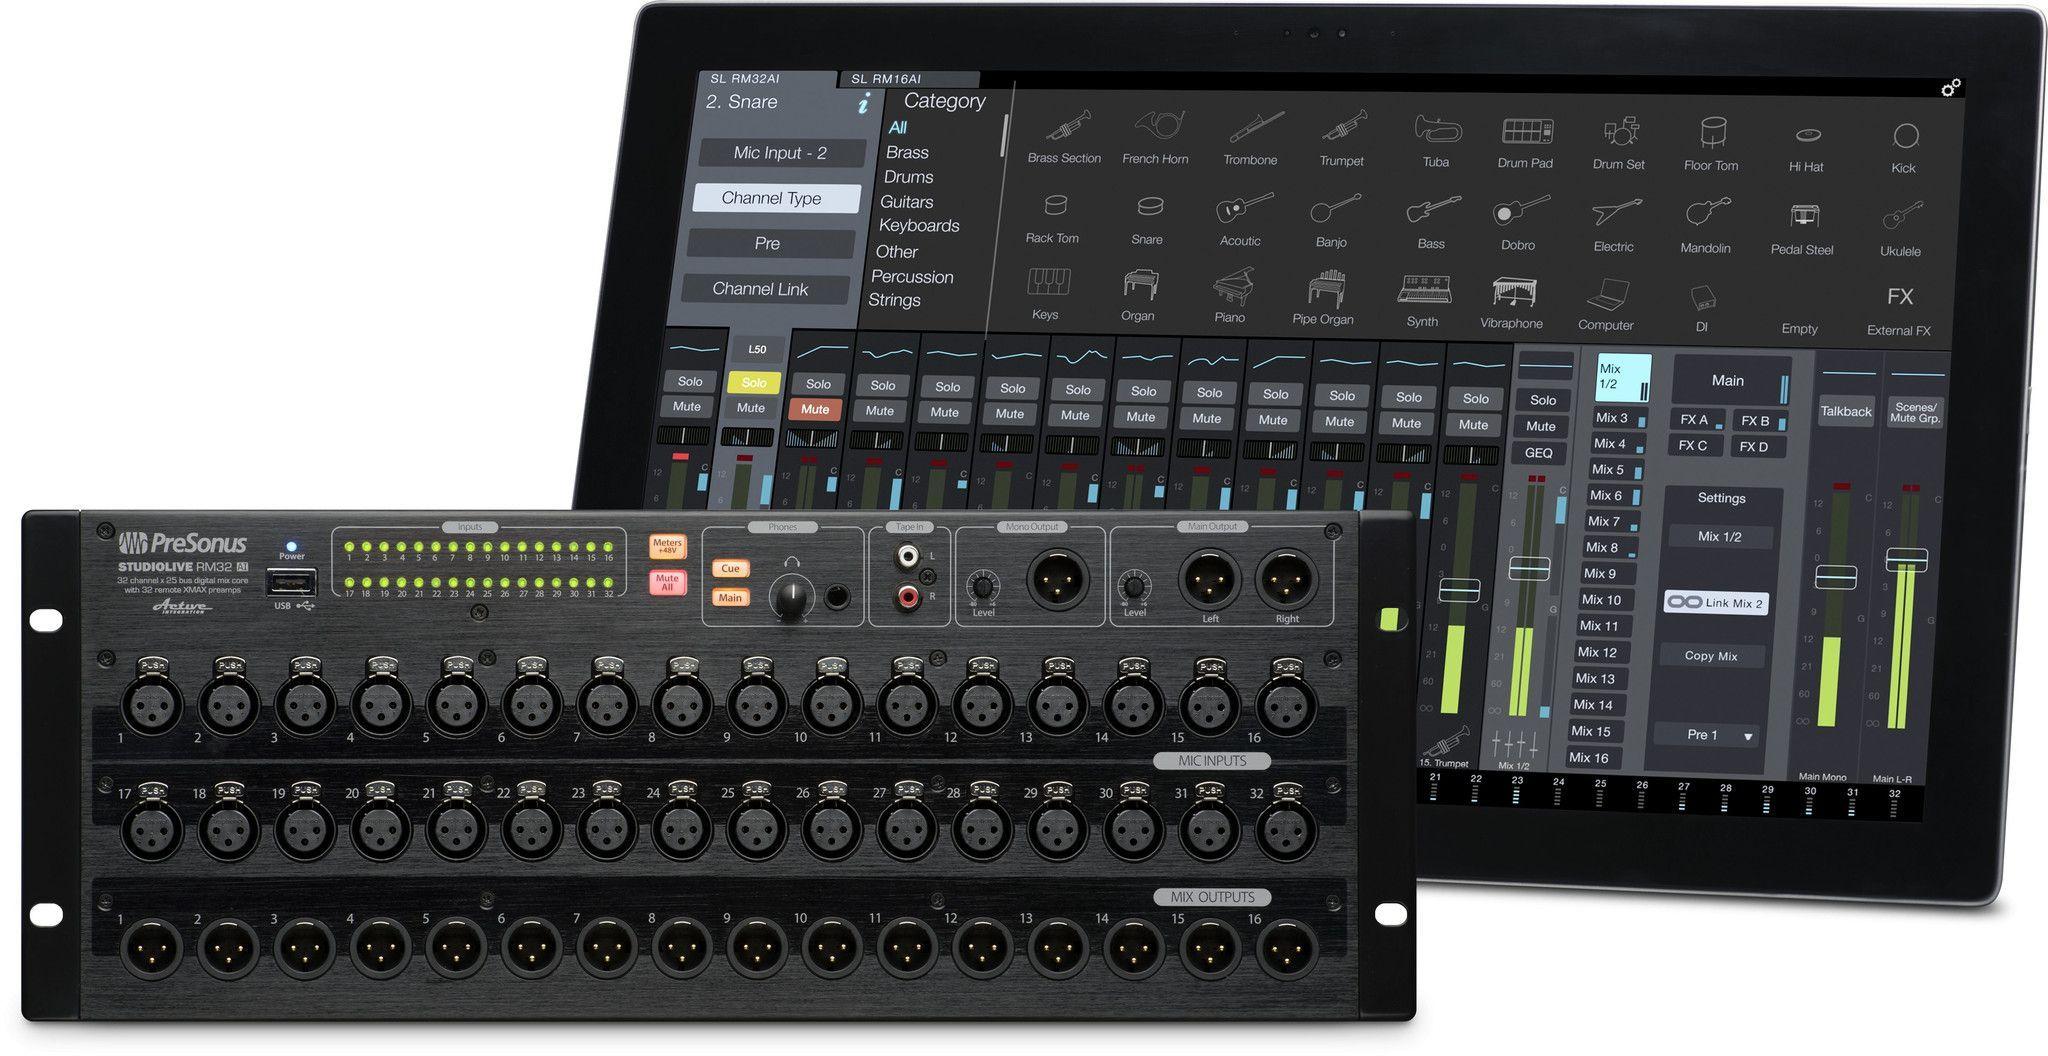 Presonus Studiolive Rm32ai 32 Channel Rack Mount Mixer With